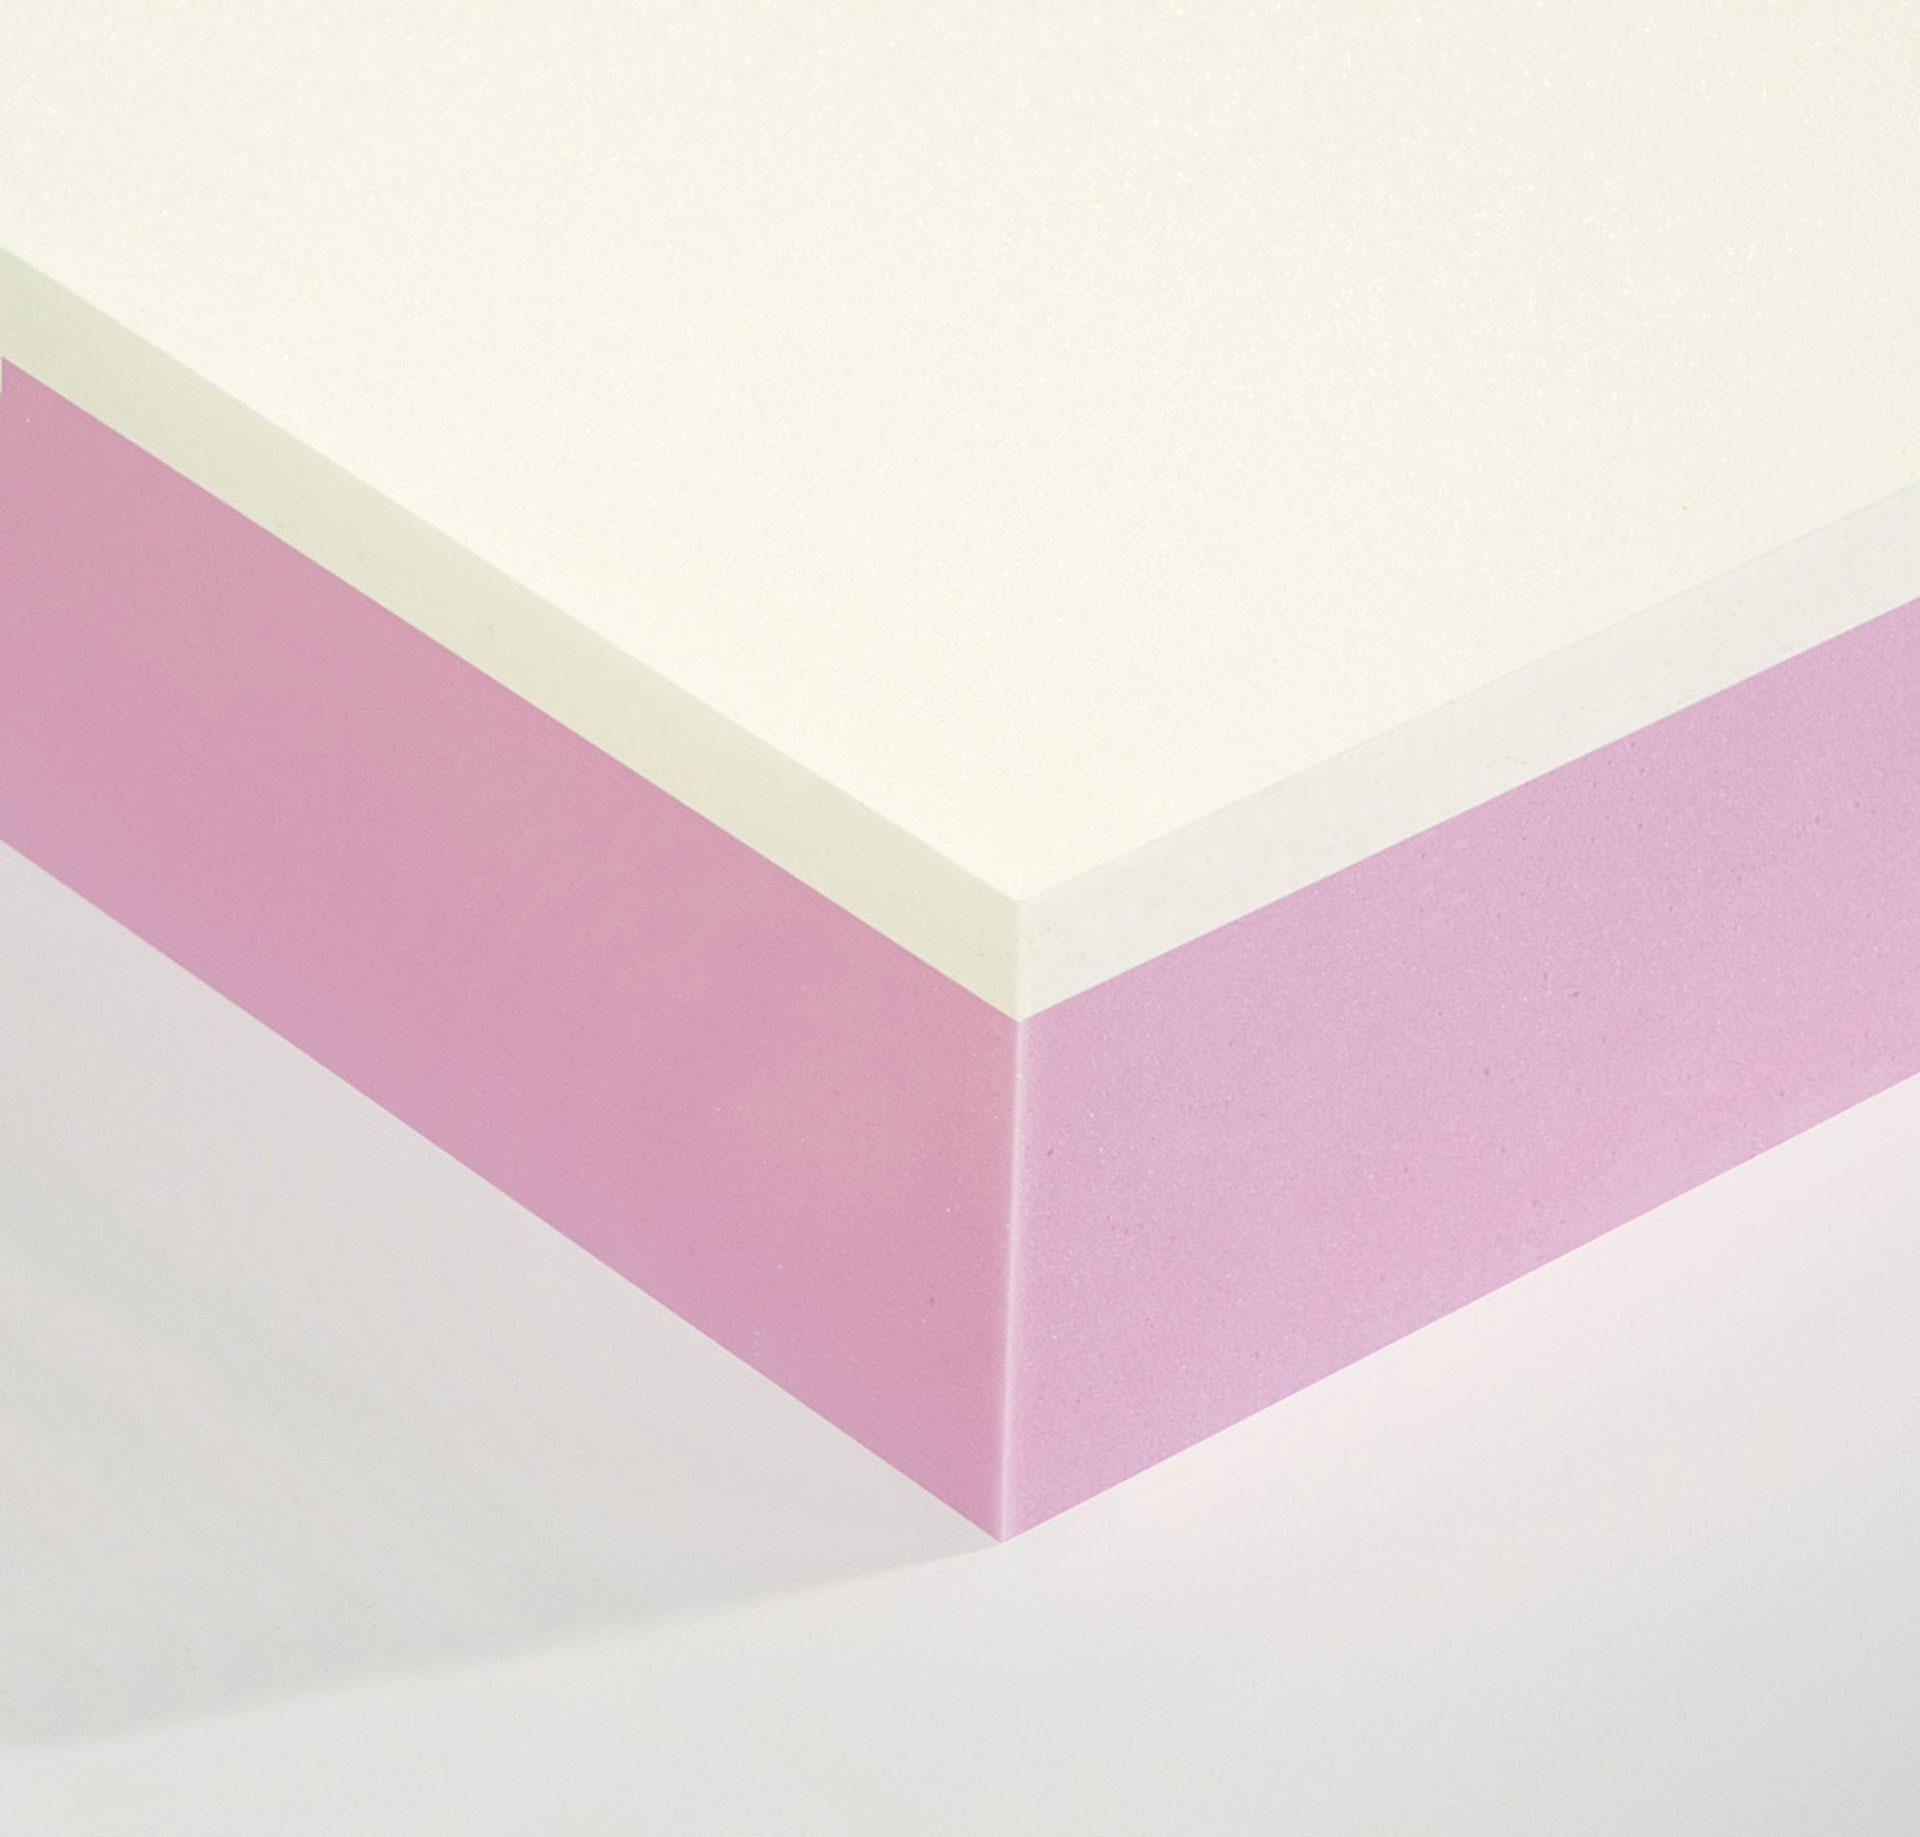 Polifoam Memory 5 - Materasso Memory Foam - Poliuretano materassi materassi ginnastica misure king